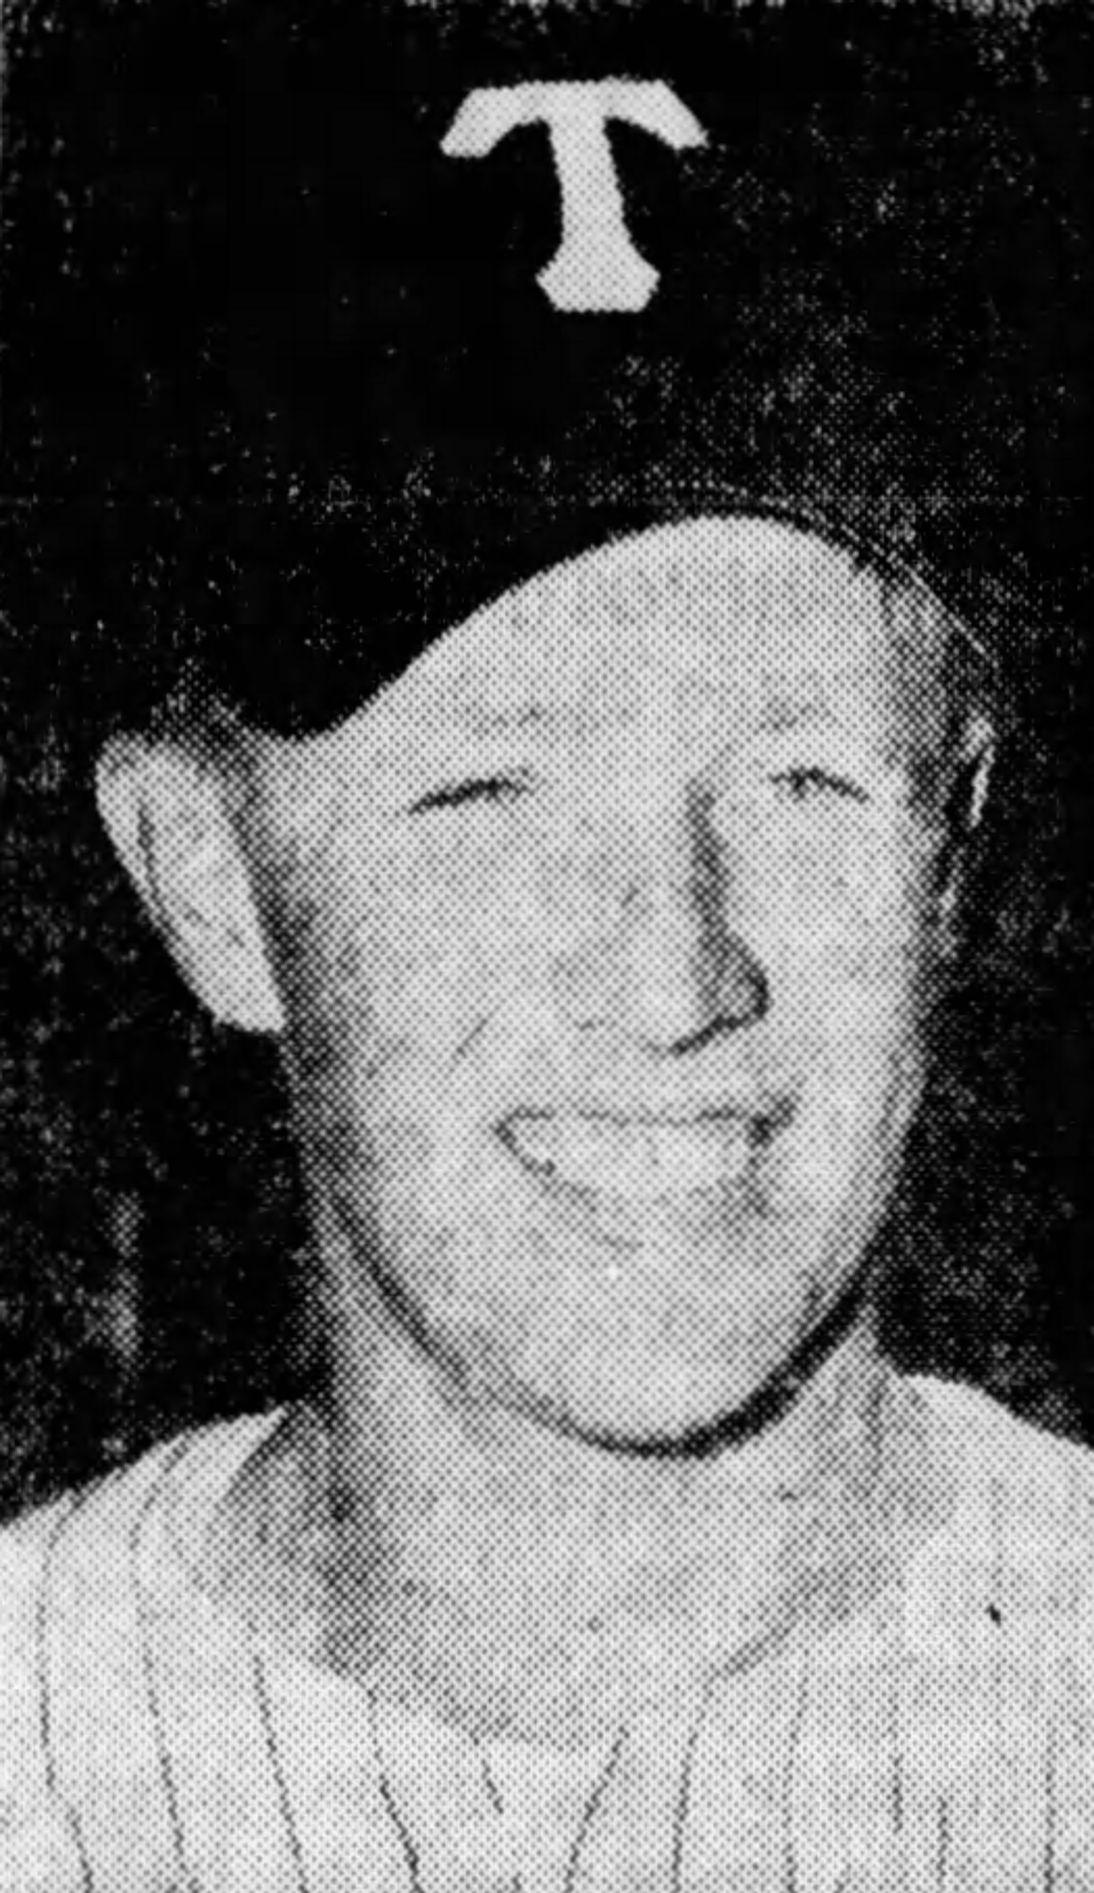 1. LeRoy Reddell, 1953